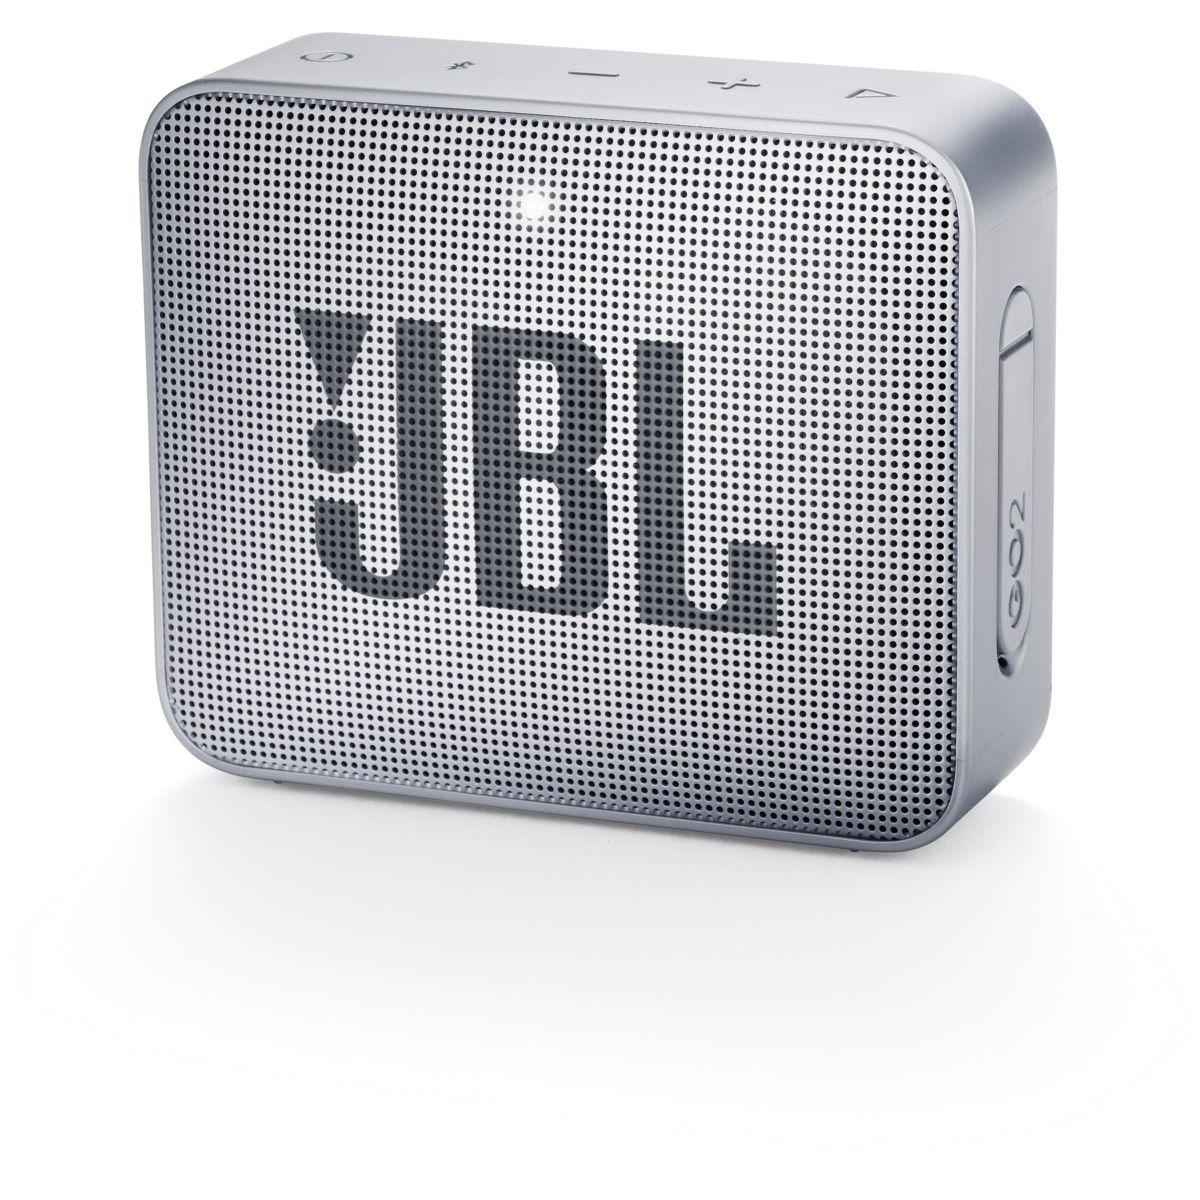 Enceinte bluetooth jbl go 2 gris - livraison offerte : code liv (photo)